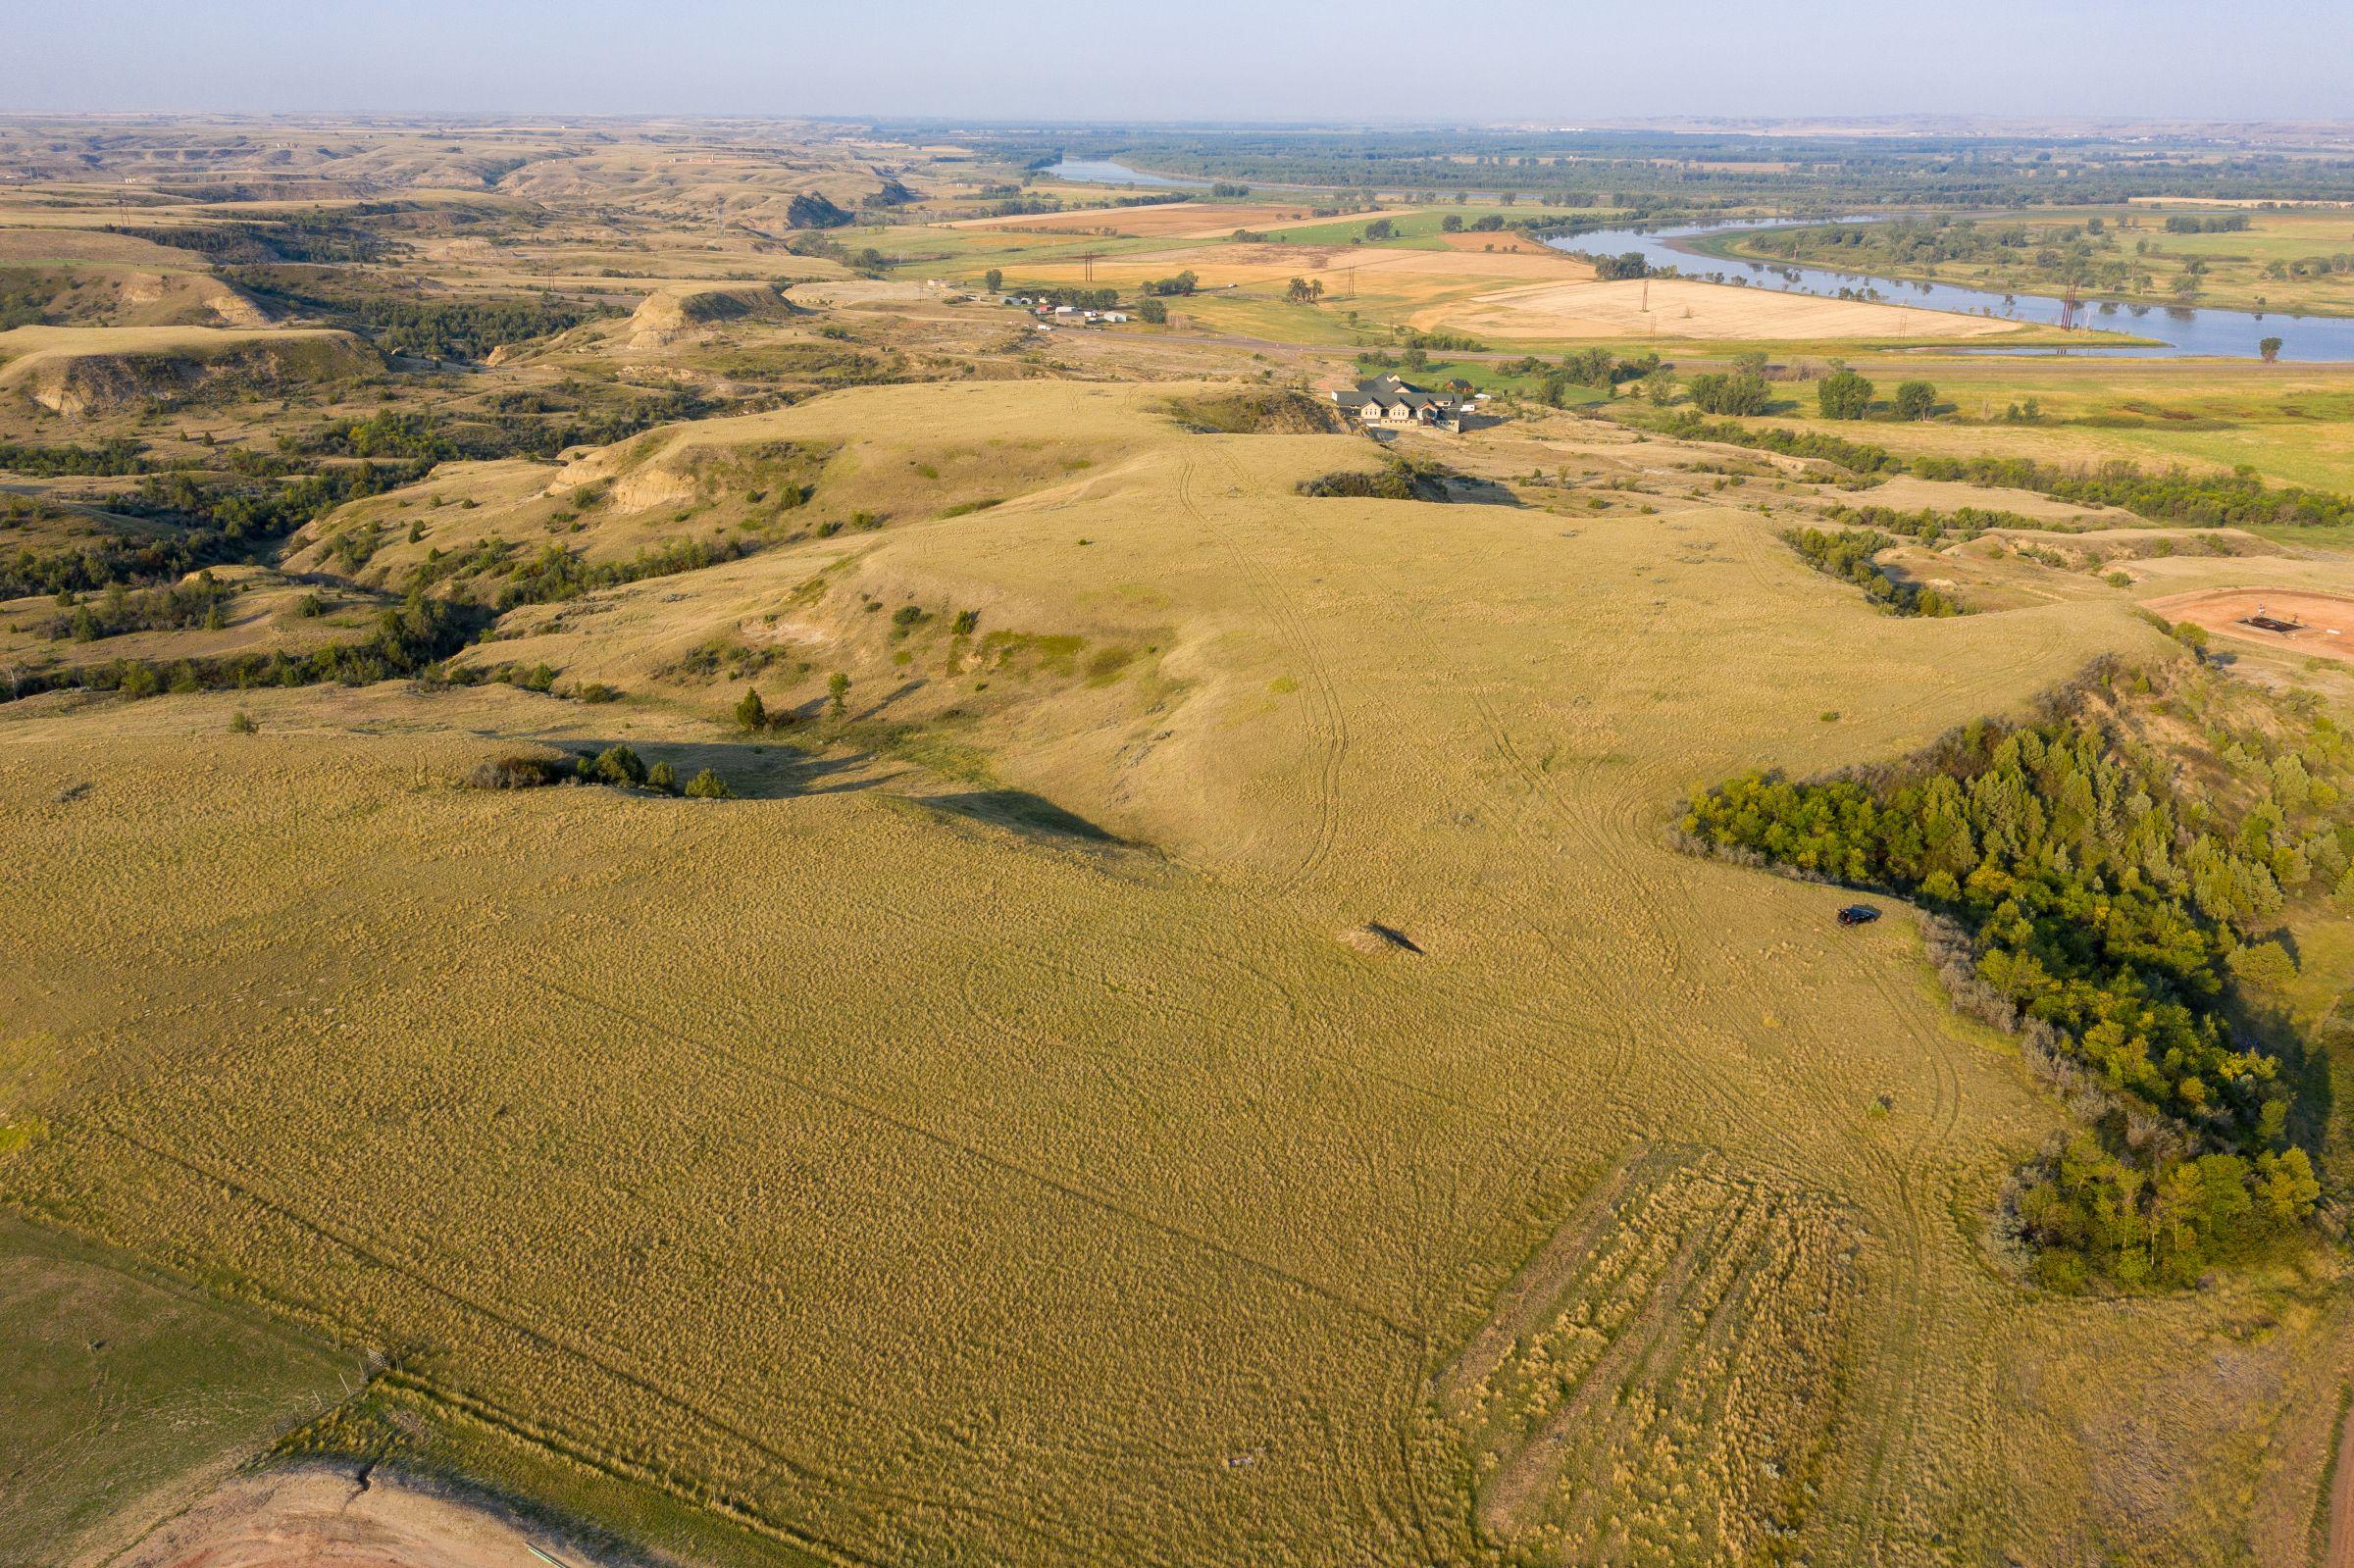 auctions-land-mckenzie-county-north-dakota-270-acres-listing-number-15735-0-2021-09-10-125100.jpeg